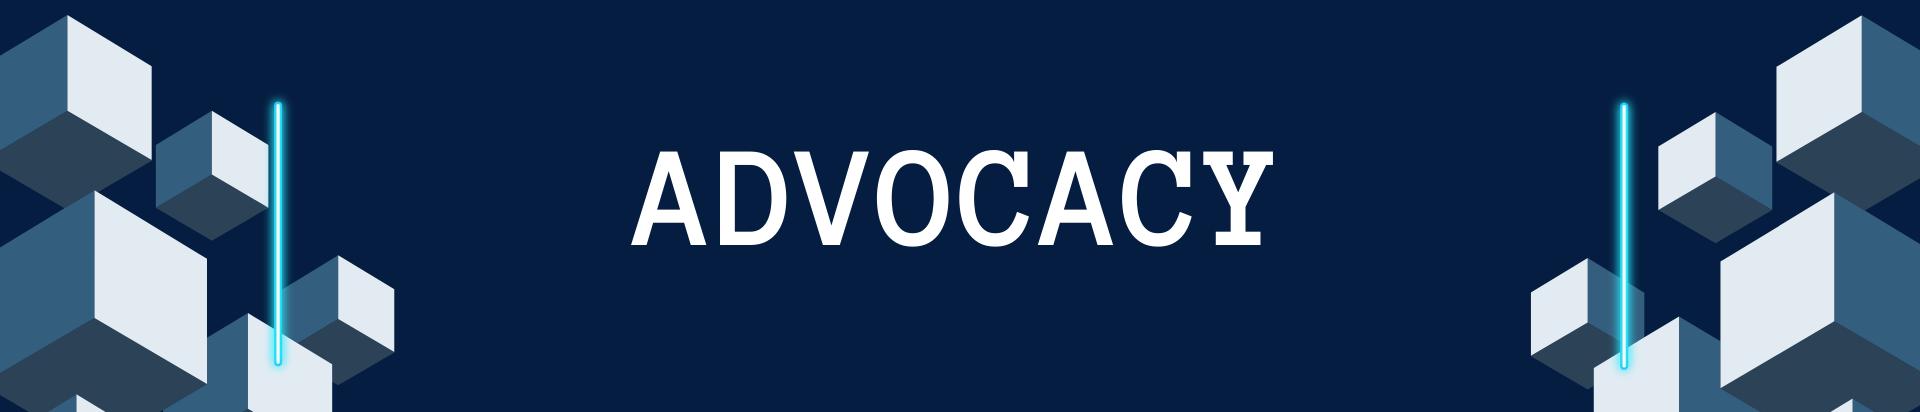 advocacy header